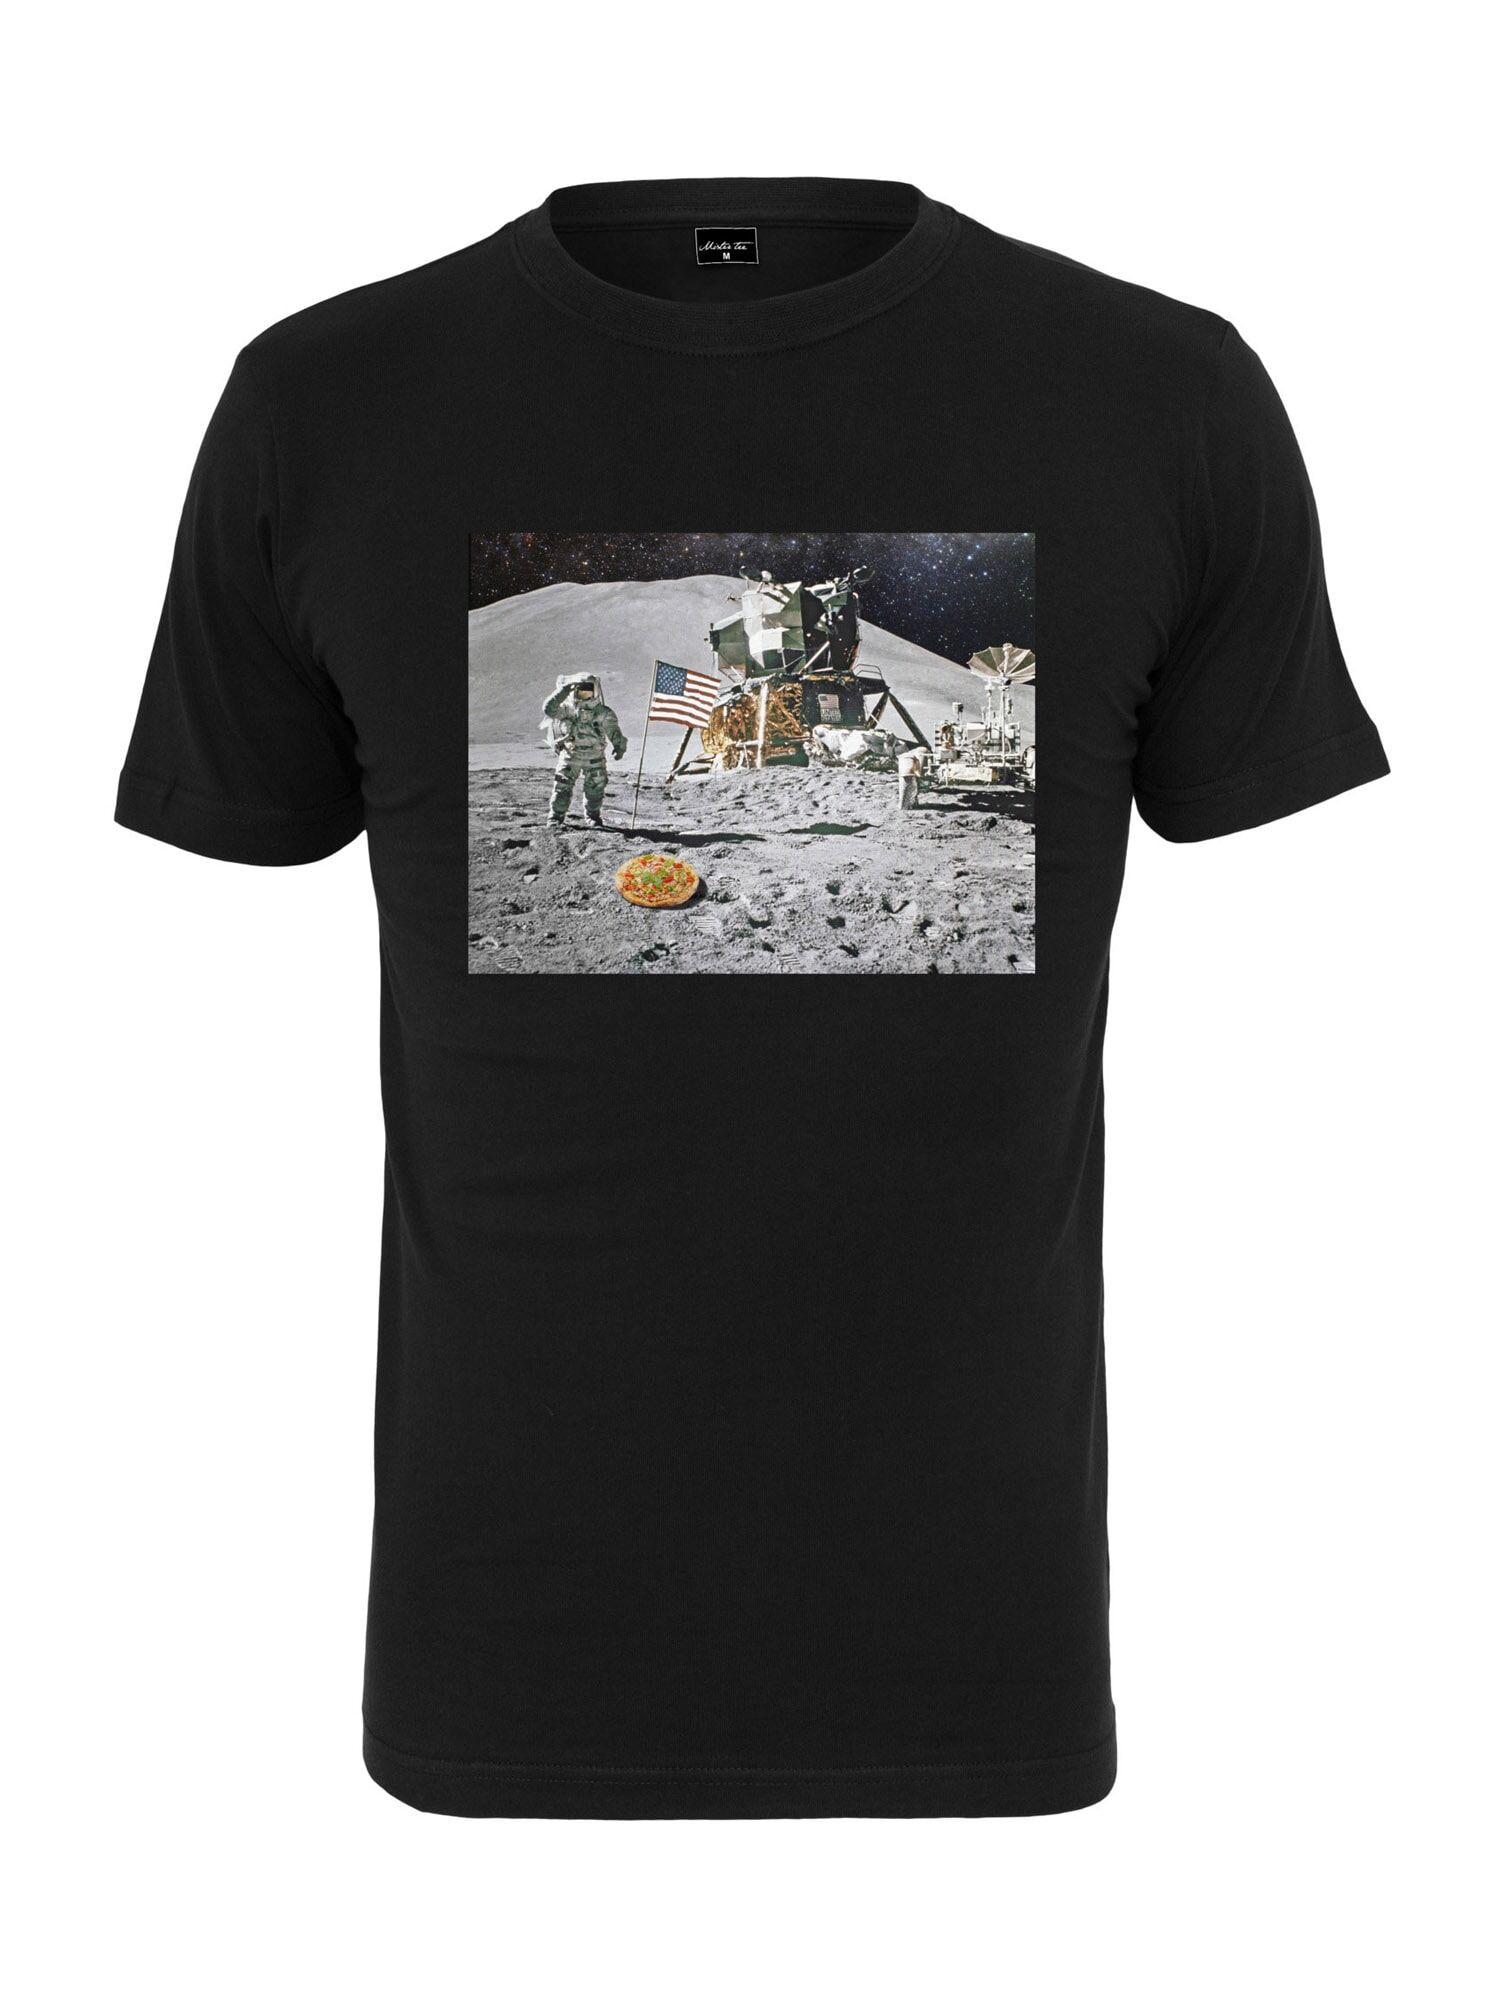 Tee T-Shirt 'Pizza Moon Landing'  - Noir - Taille: S - male